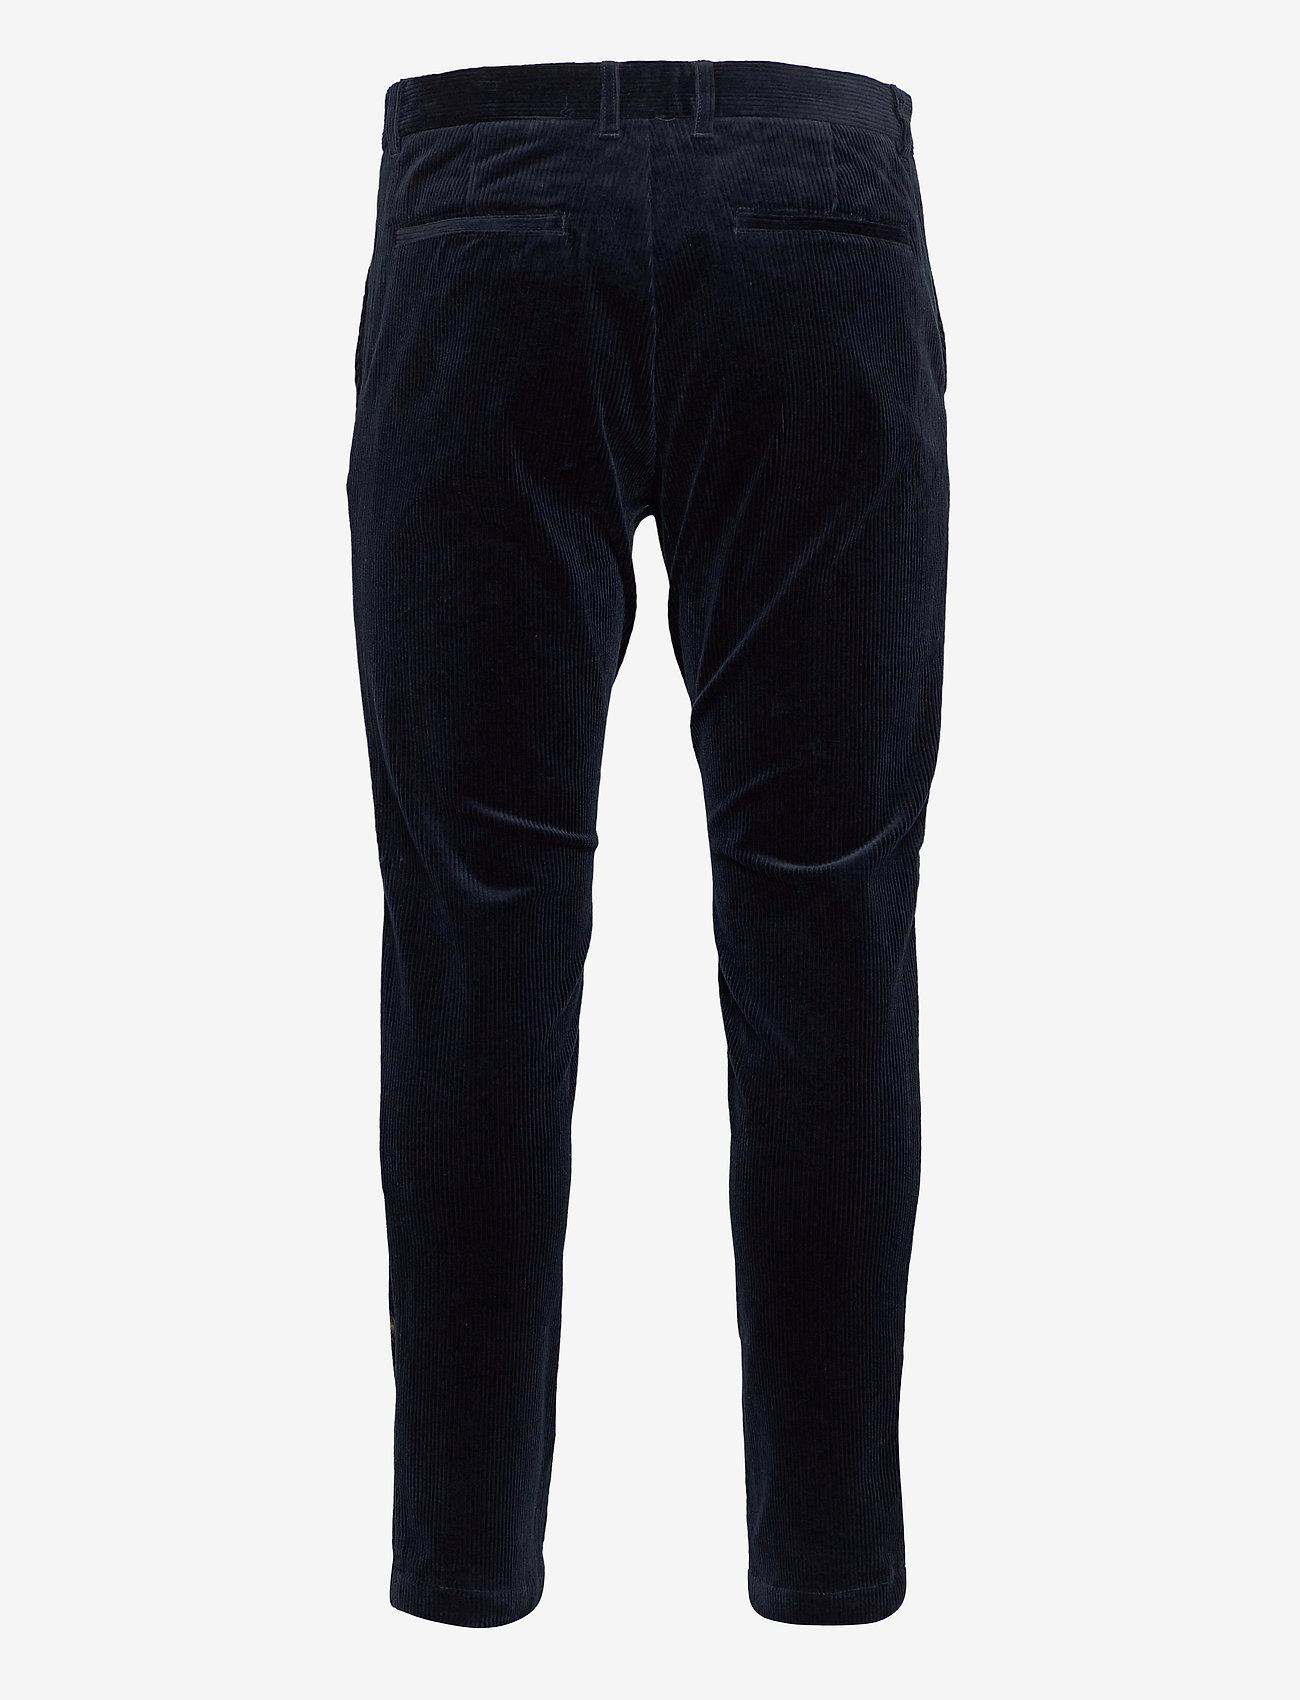 Samsøe Samsøe Andy x trousers 11046 - Bukser SKY CAPTAIN - Menn Klær